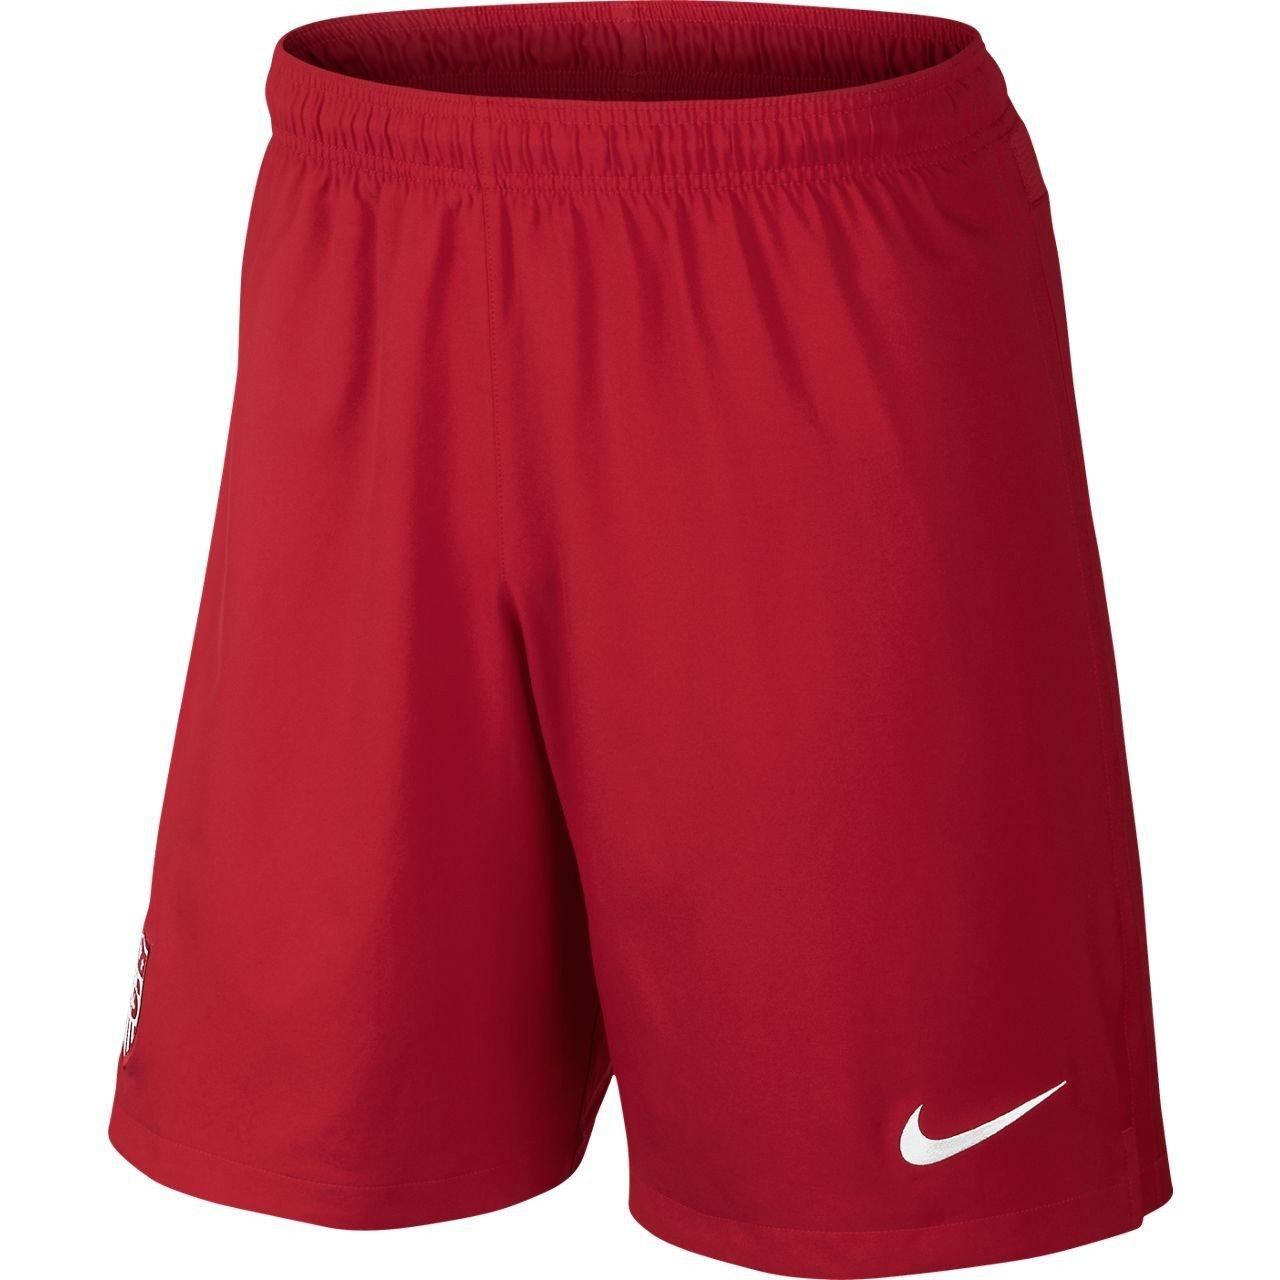 2014-15 USA Nike Away Shorts (Red) B00JEGMM8ERed S 26-28\